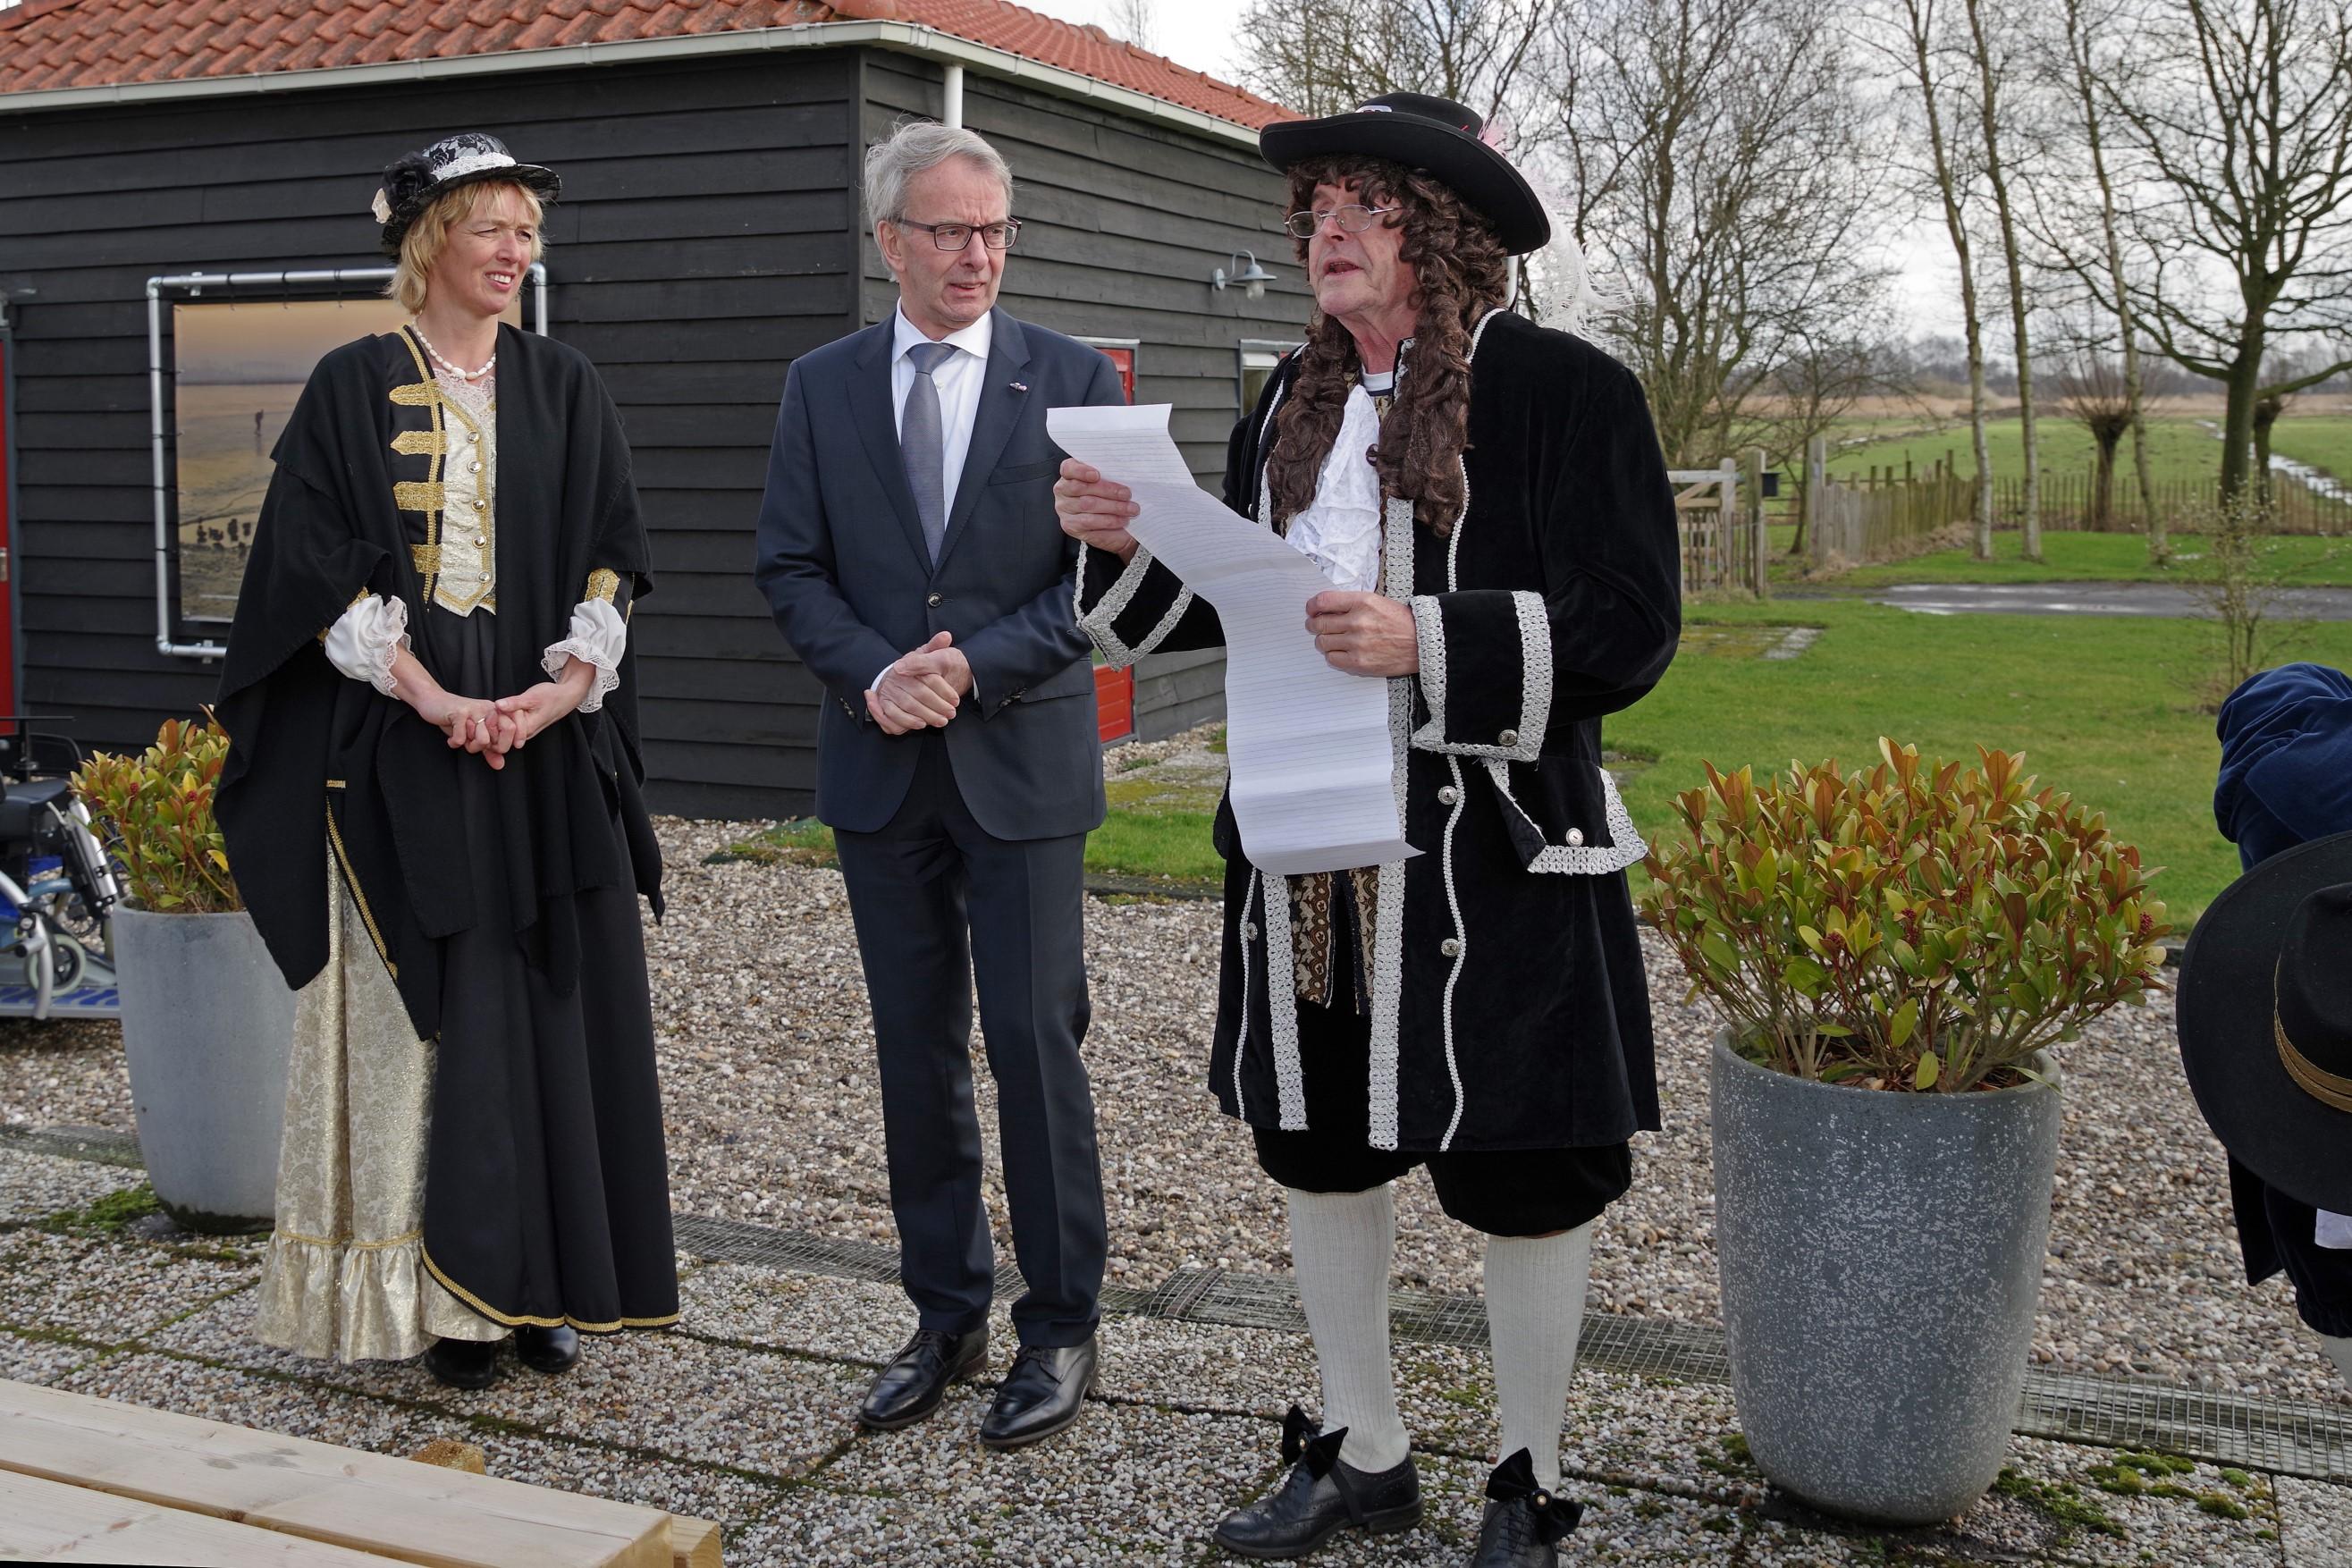 Pieter Stuyvesant kuiertocht 2017